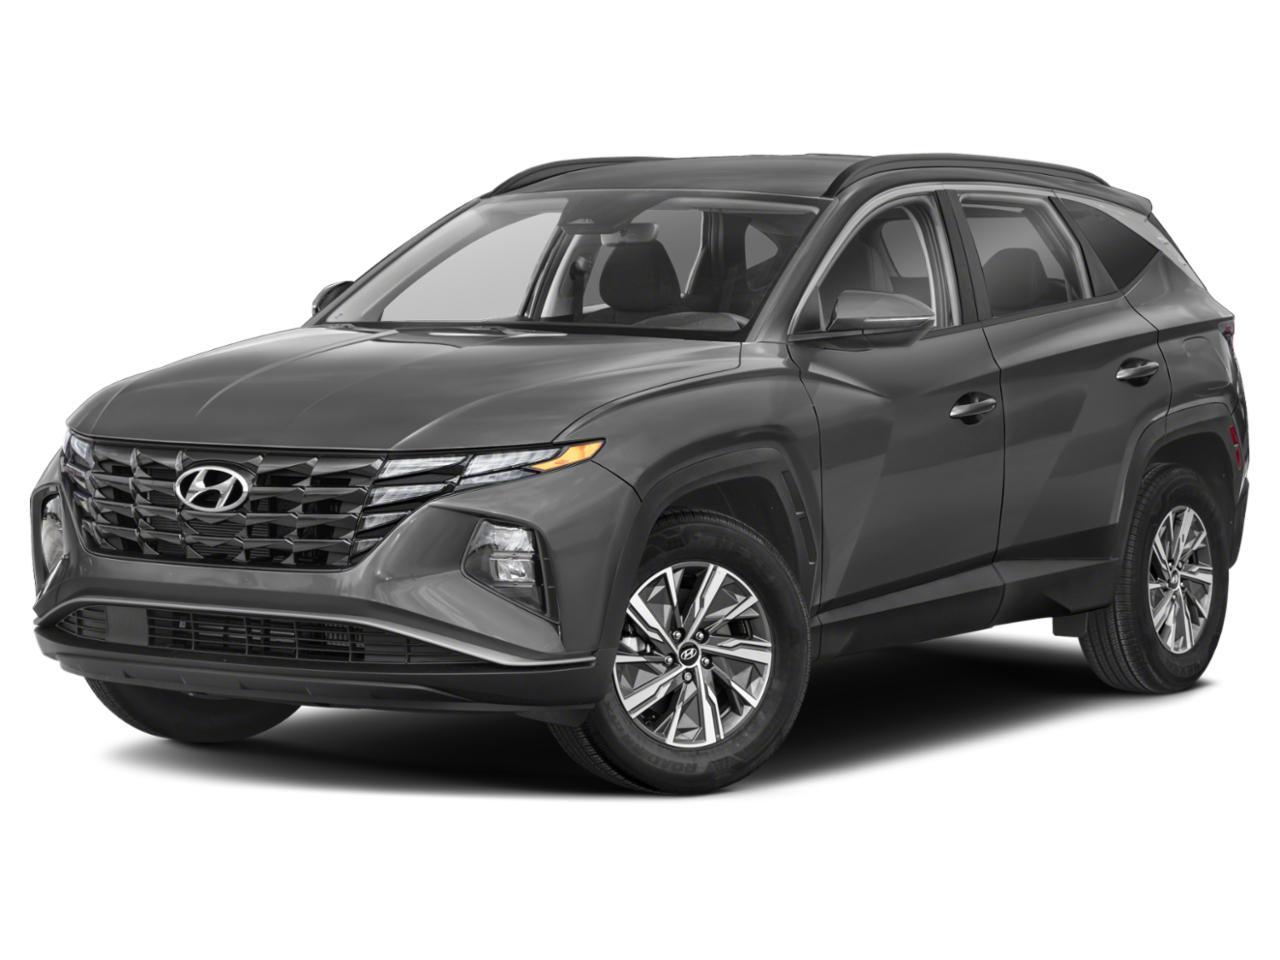 2022 Hyundai Tucson Hybrid Vehicle Photo in Nashua, NH 03060